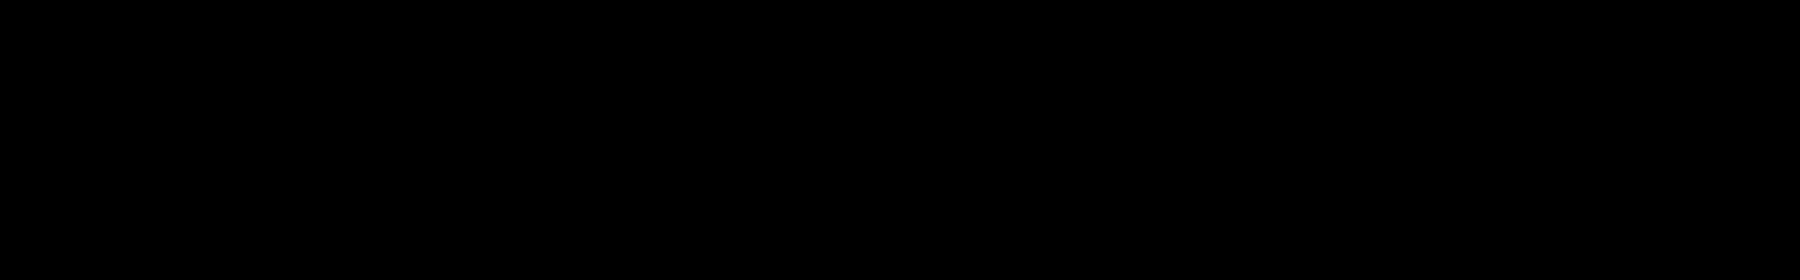 Max Braiman Vocal Trance Anthems Feat Victoriya audio waveform